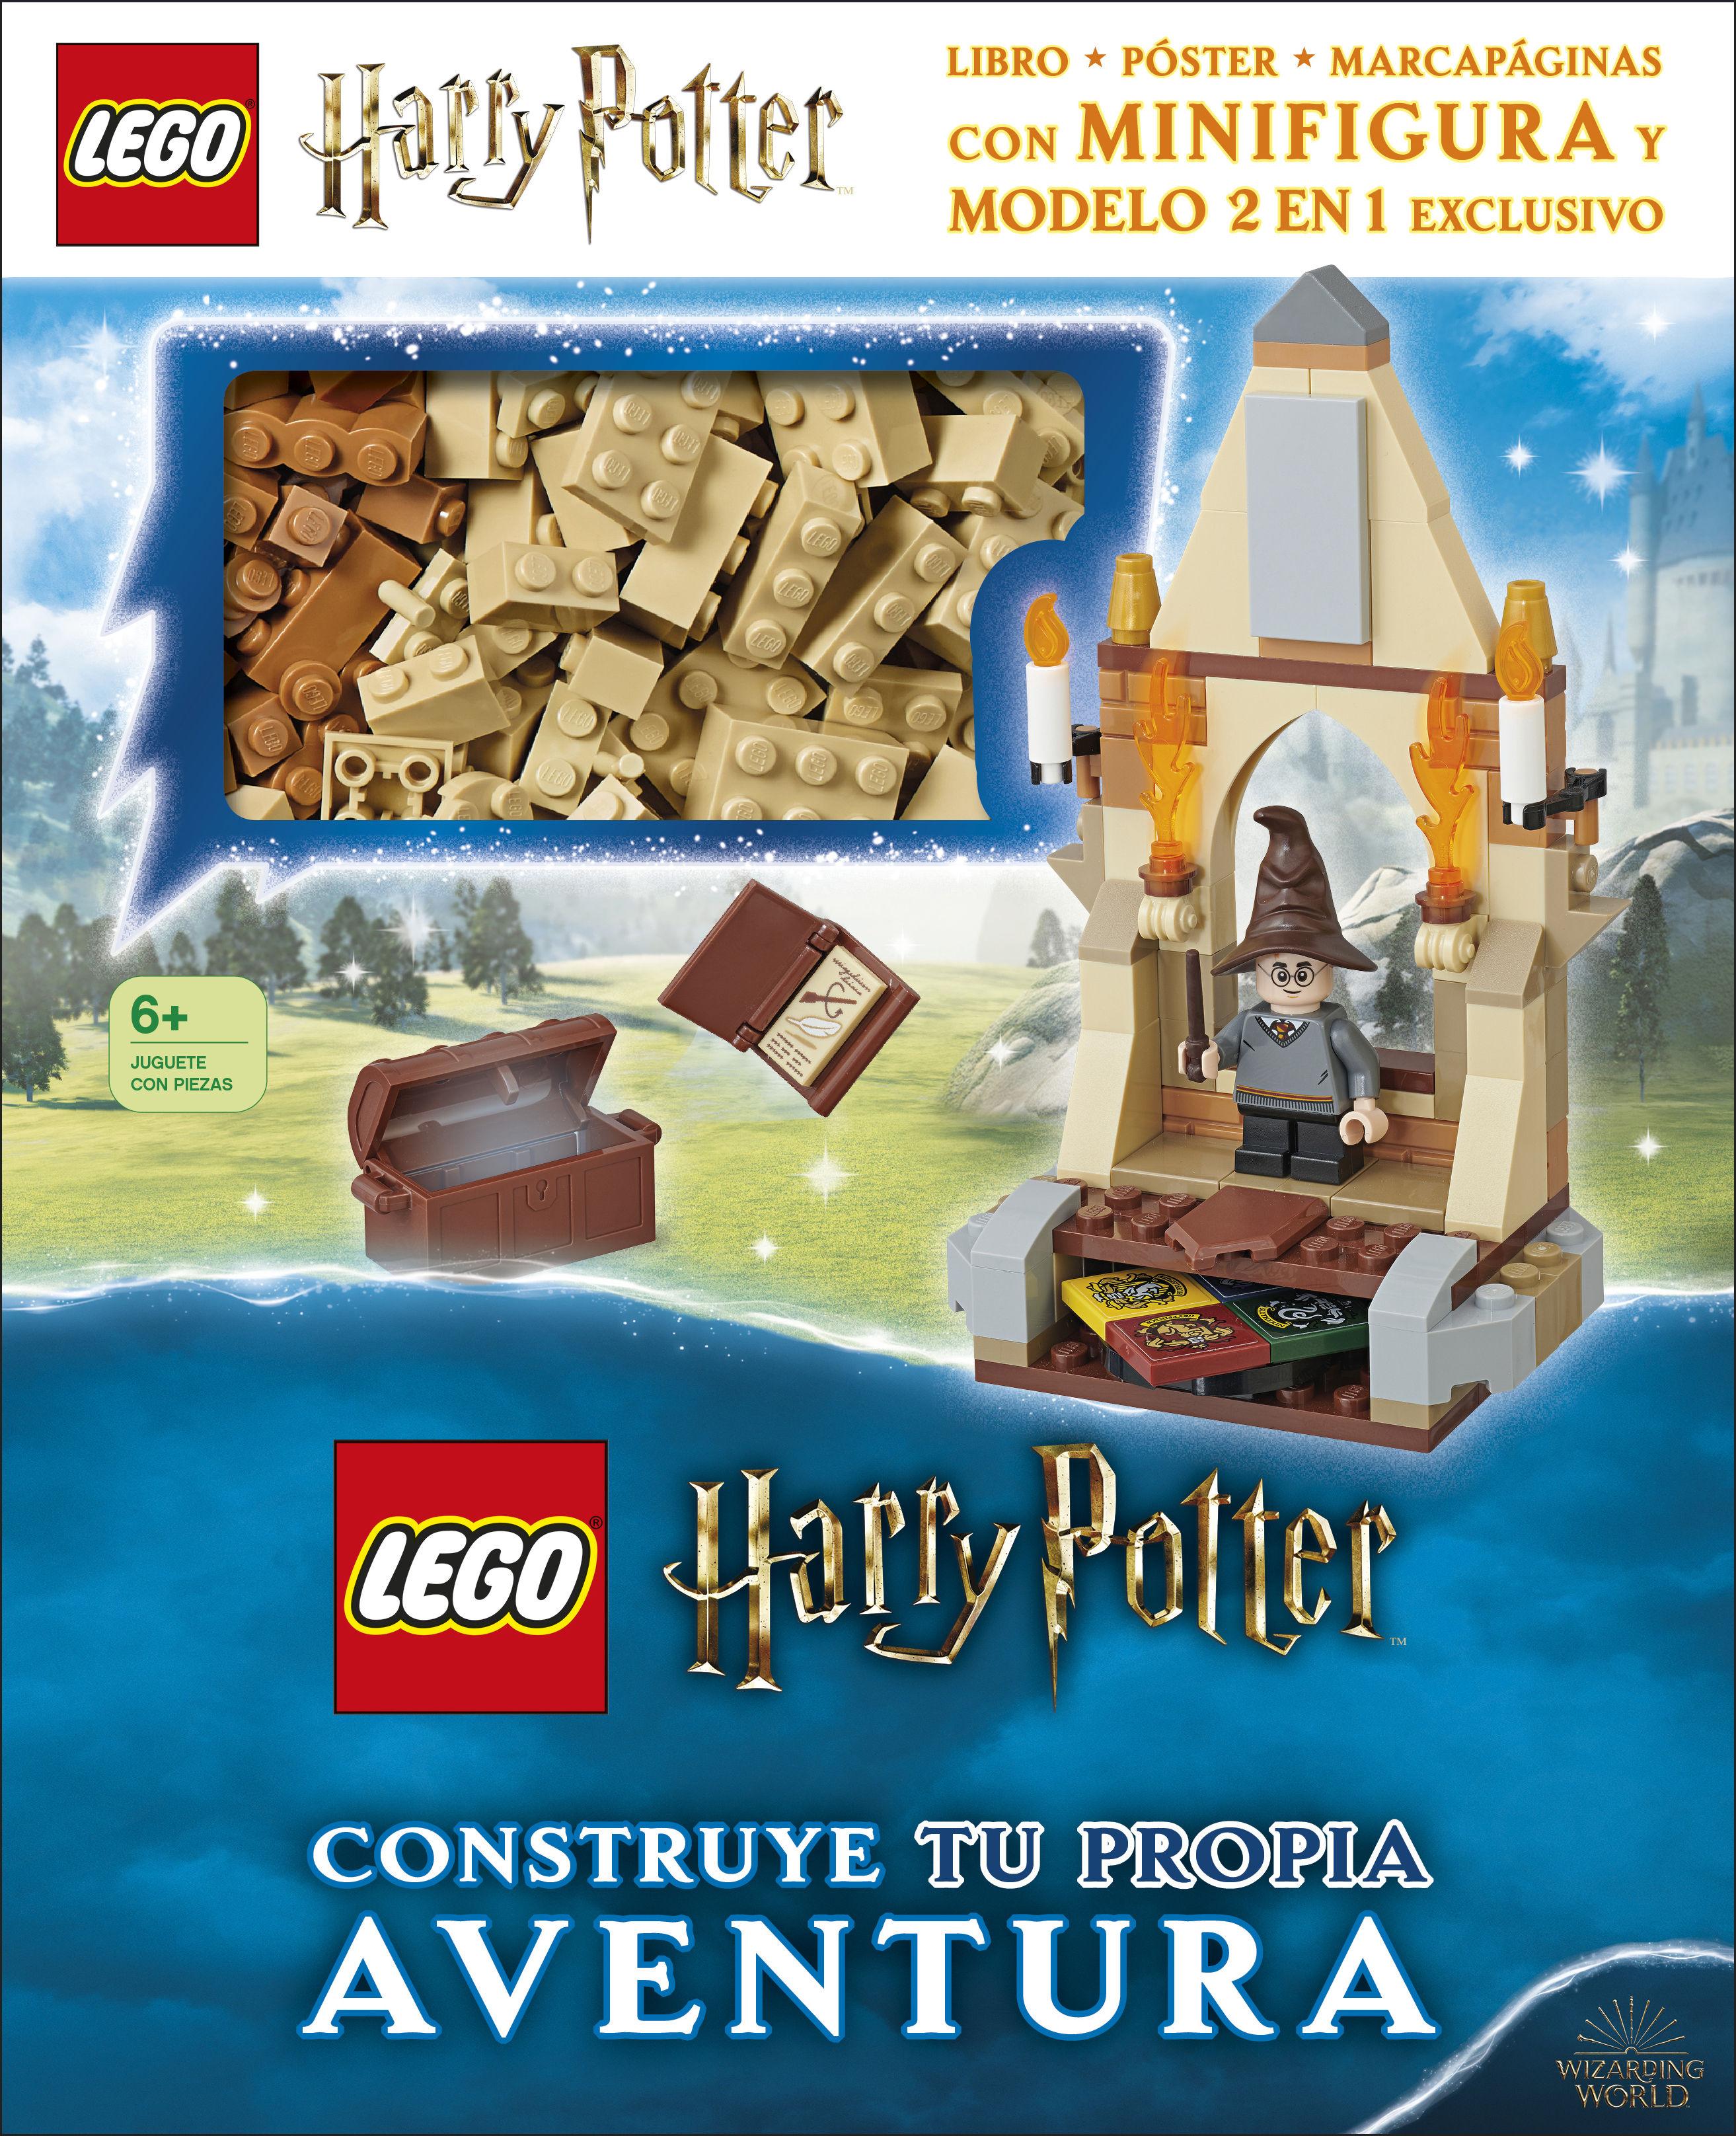 LEGO® HARRY POTTER CONSTRUYE TU PROPIA AVENTURA